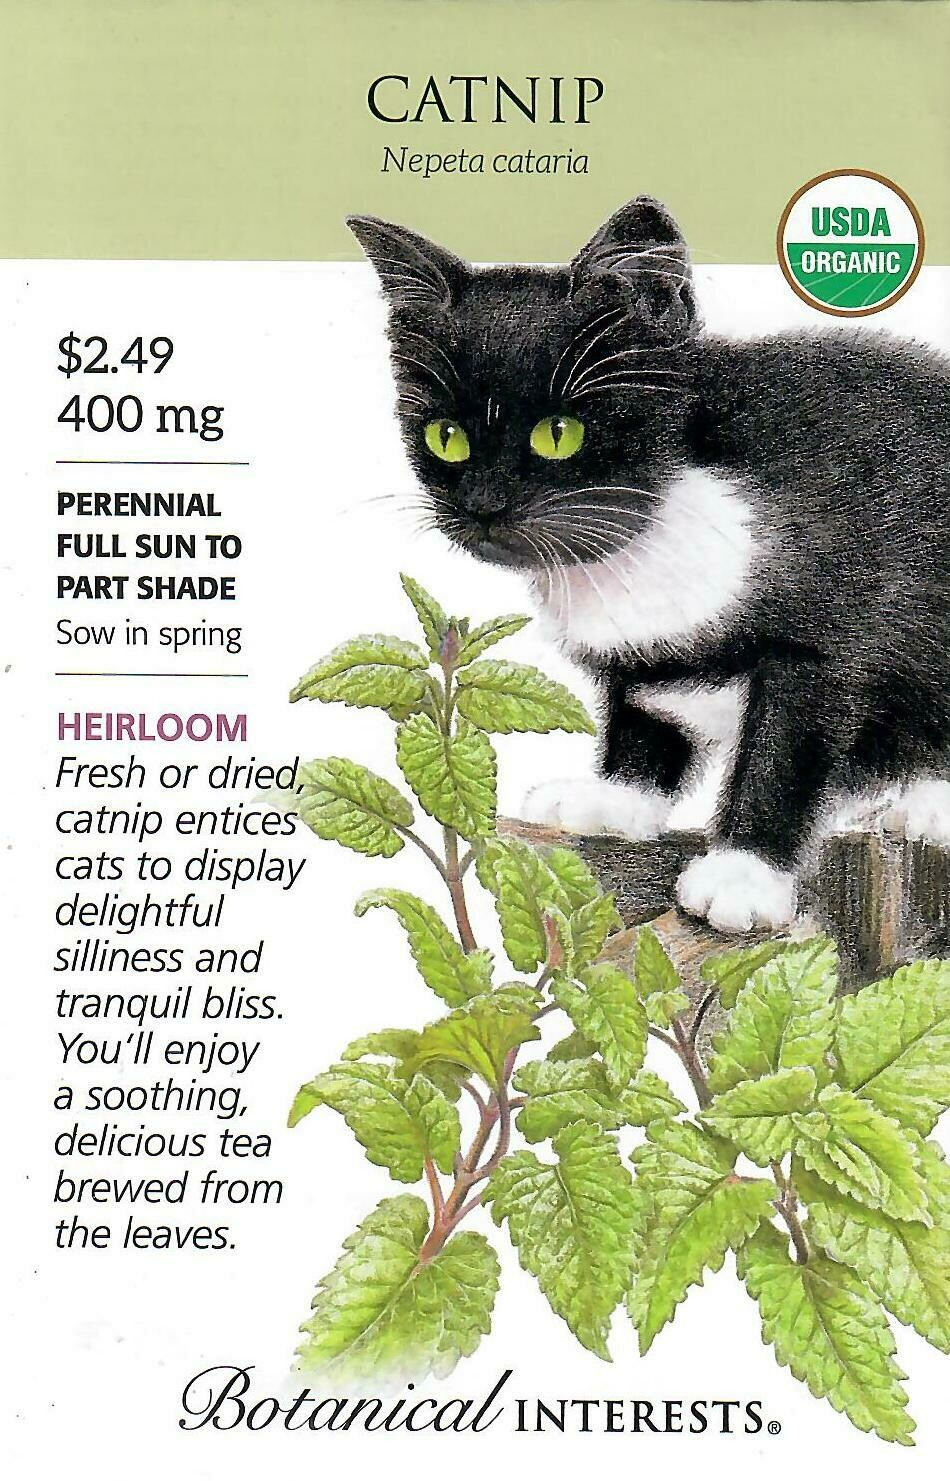 Catnip Org Botanical Interests